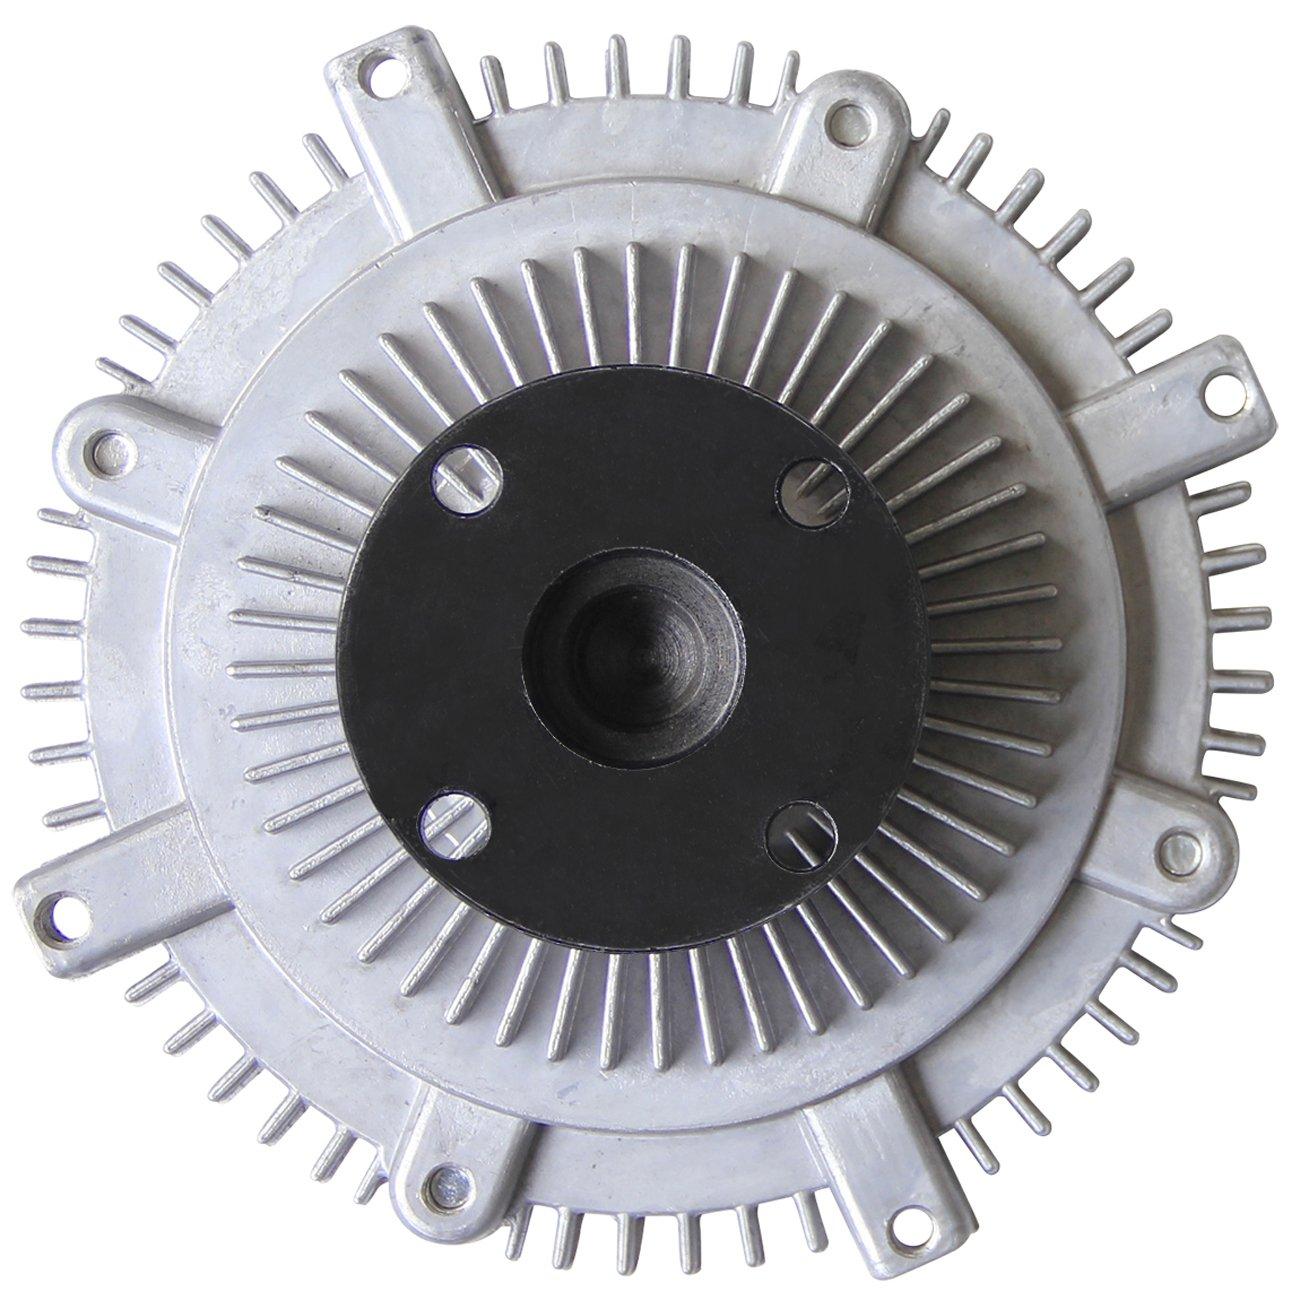 TOPAZ 6200 Engine Cooling Fan Clutch for 95-01 Kia Sportage 2.0L-L4